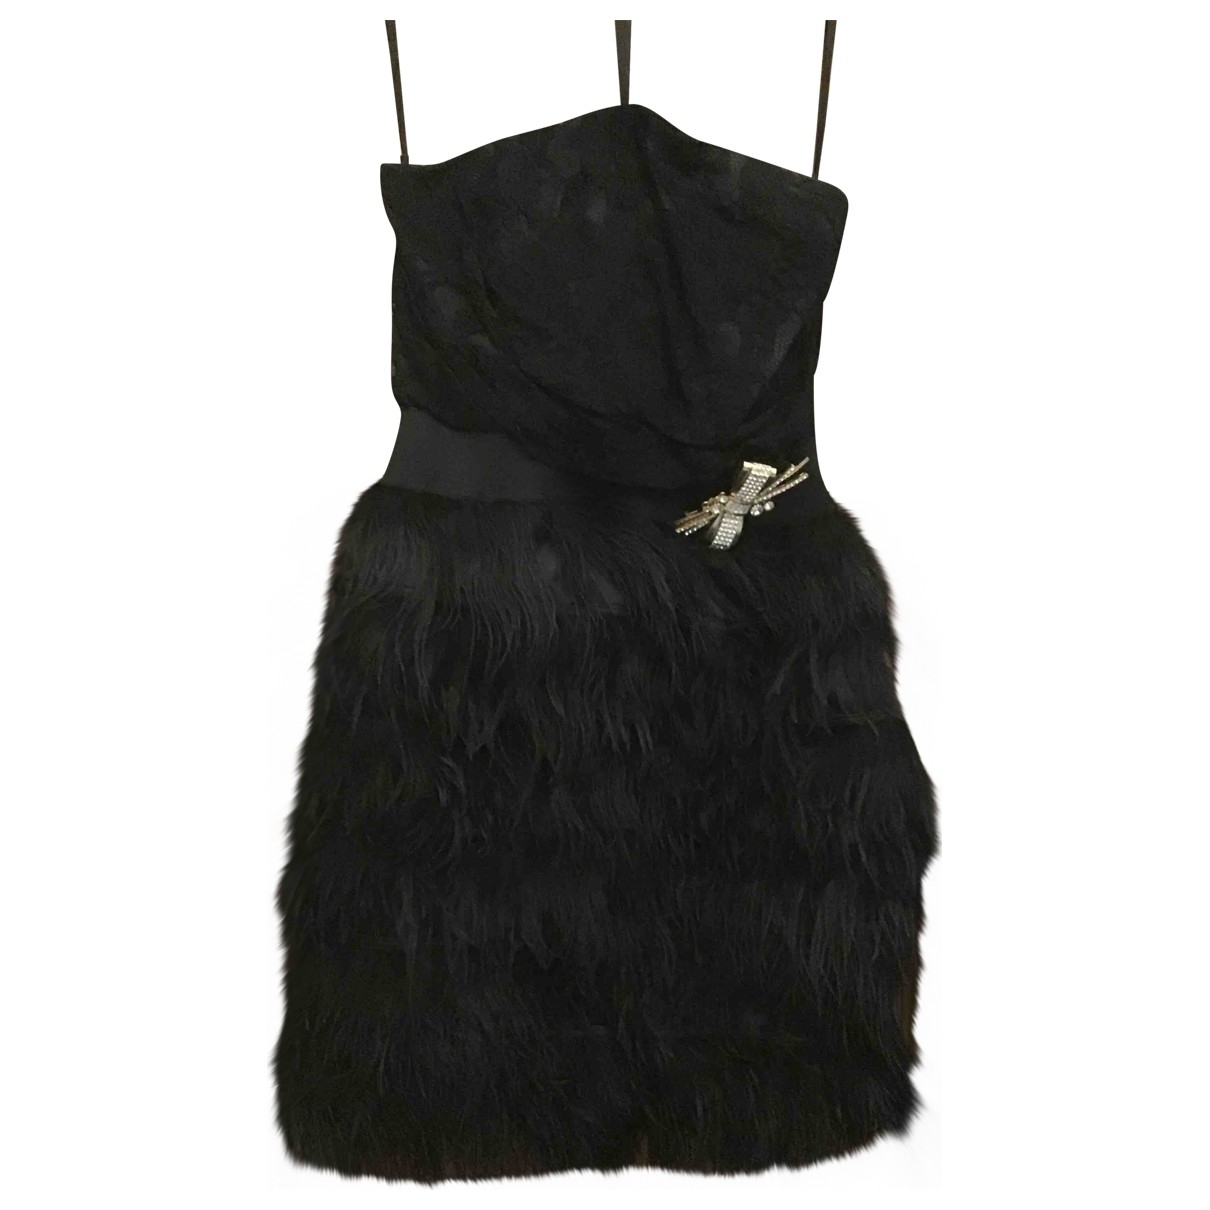 Elisabetta Franchi \N Black Lace dress for Women 40 IT